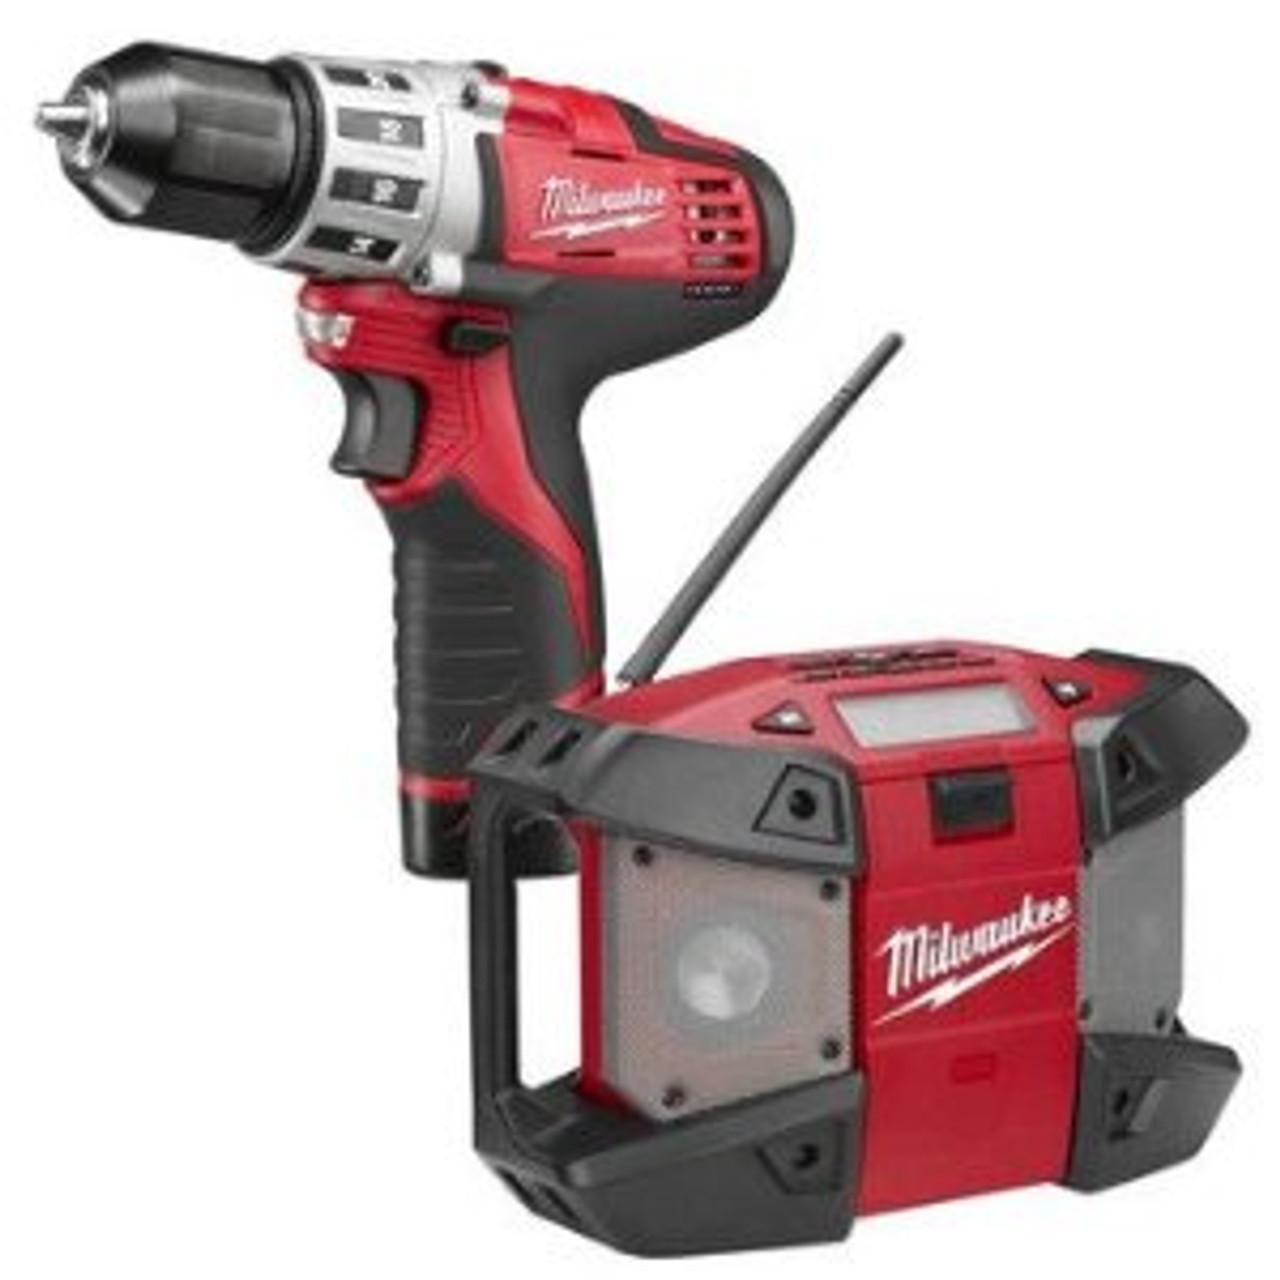 "Milwaukee M12 Cordless 3/8"" Drill Driver Kit 2410-22P"